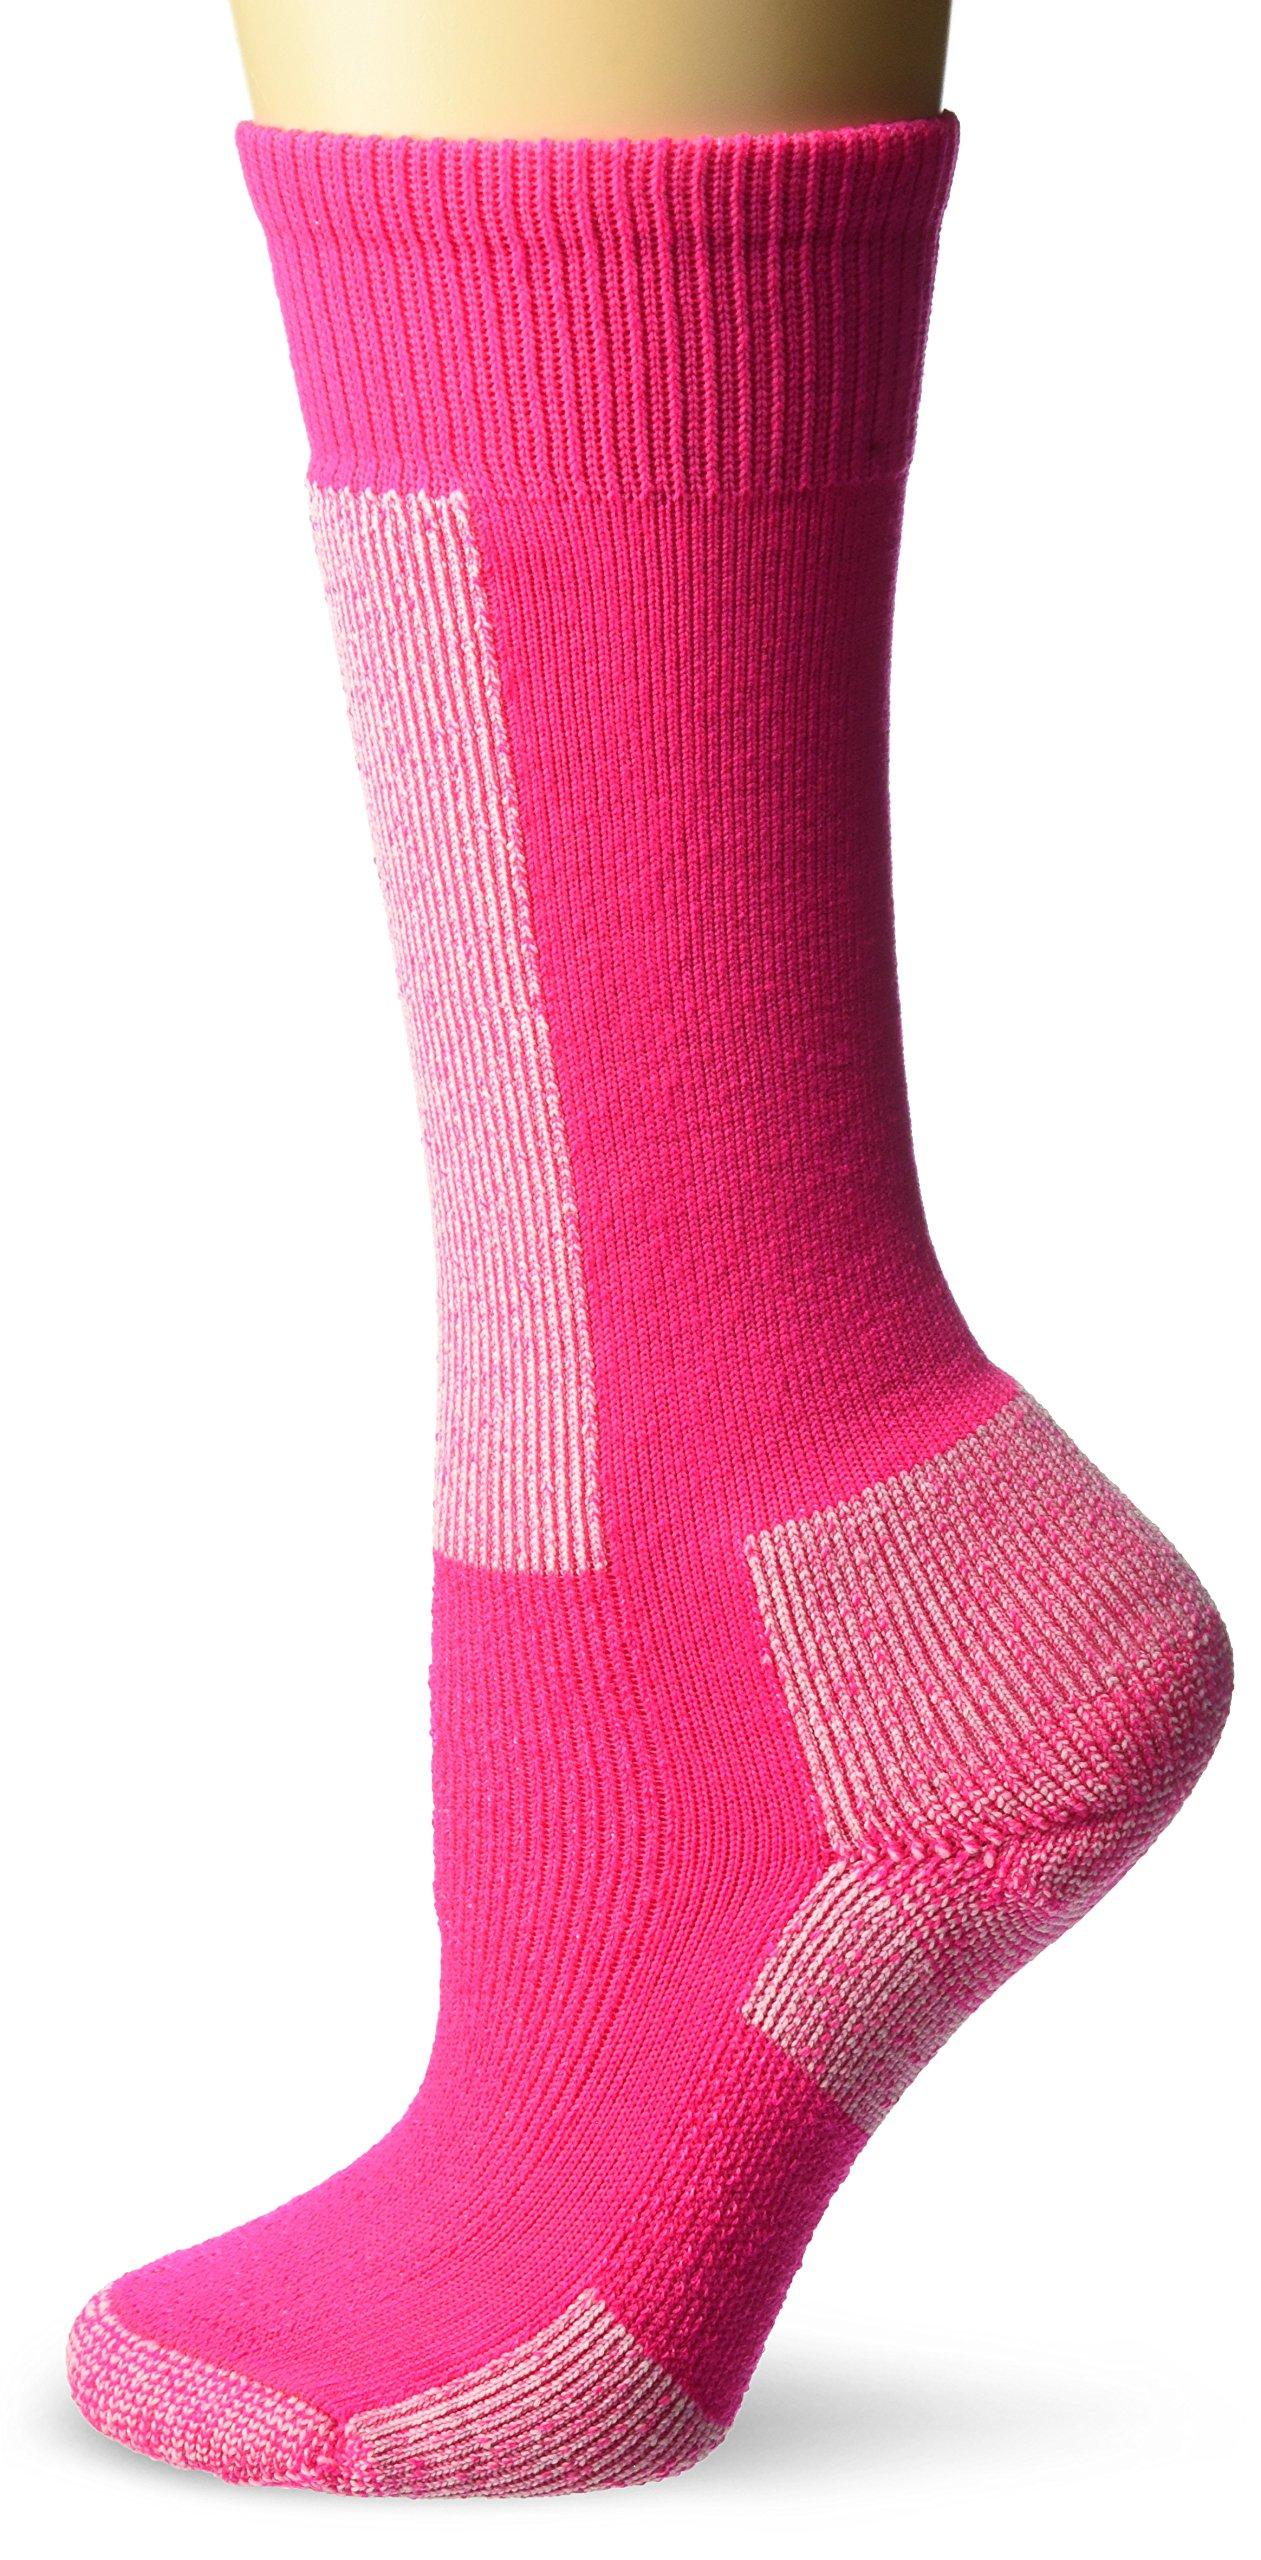 Thorlos Kids KS Snow Padded Over the Calf Sock, Pink, Small by Thorlo